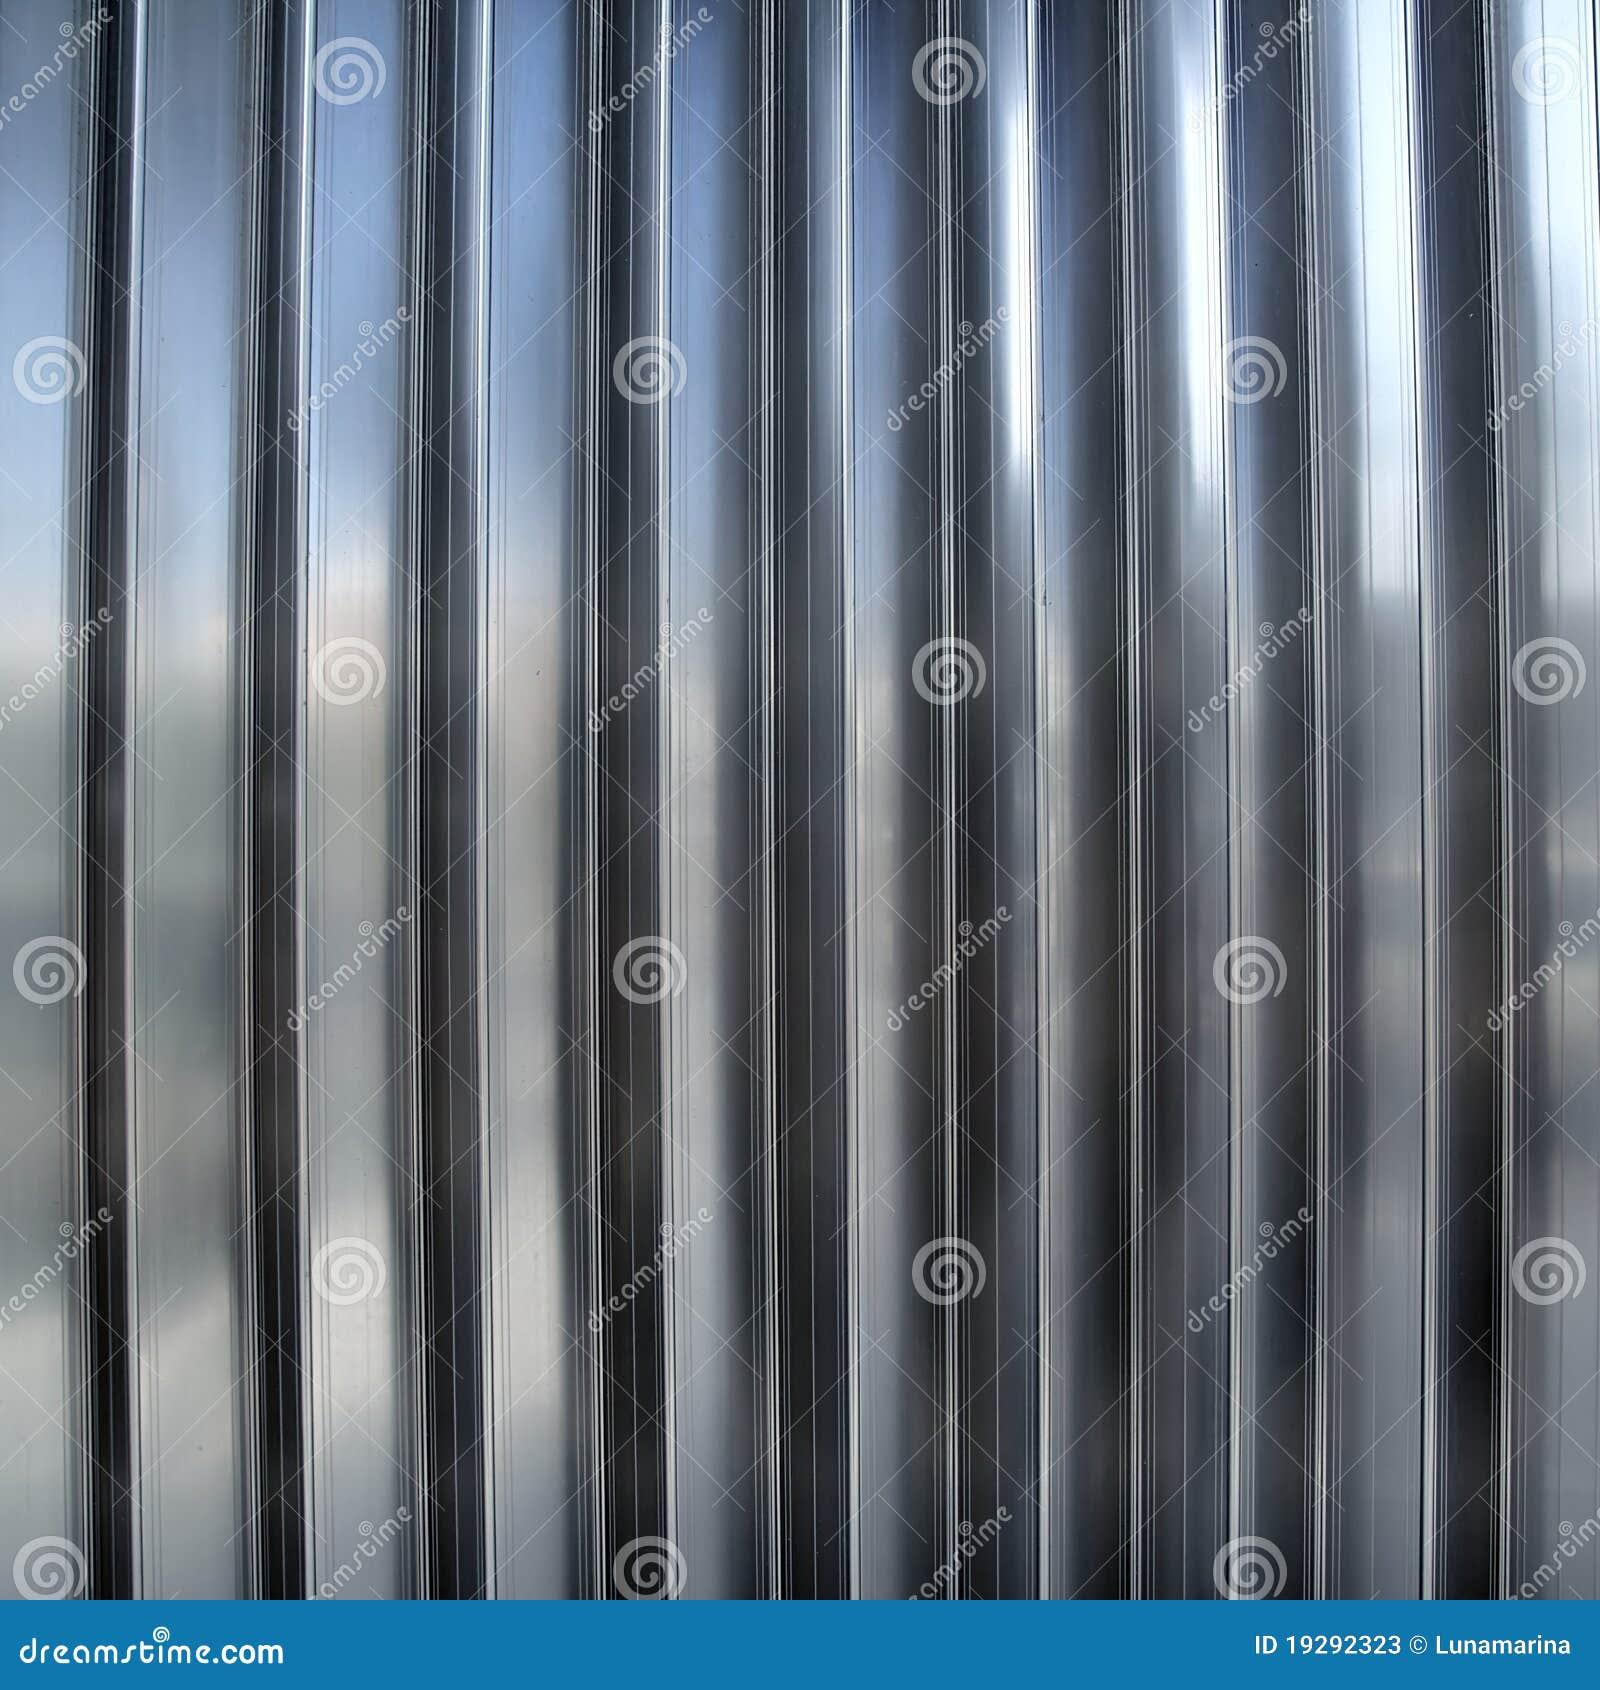 Stainless Steel Silver Metal Stripes Texture Rows Stock Photos ...